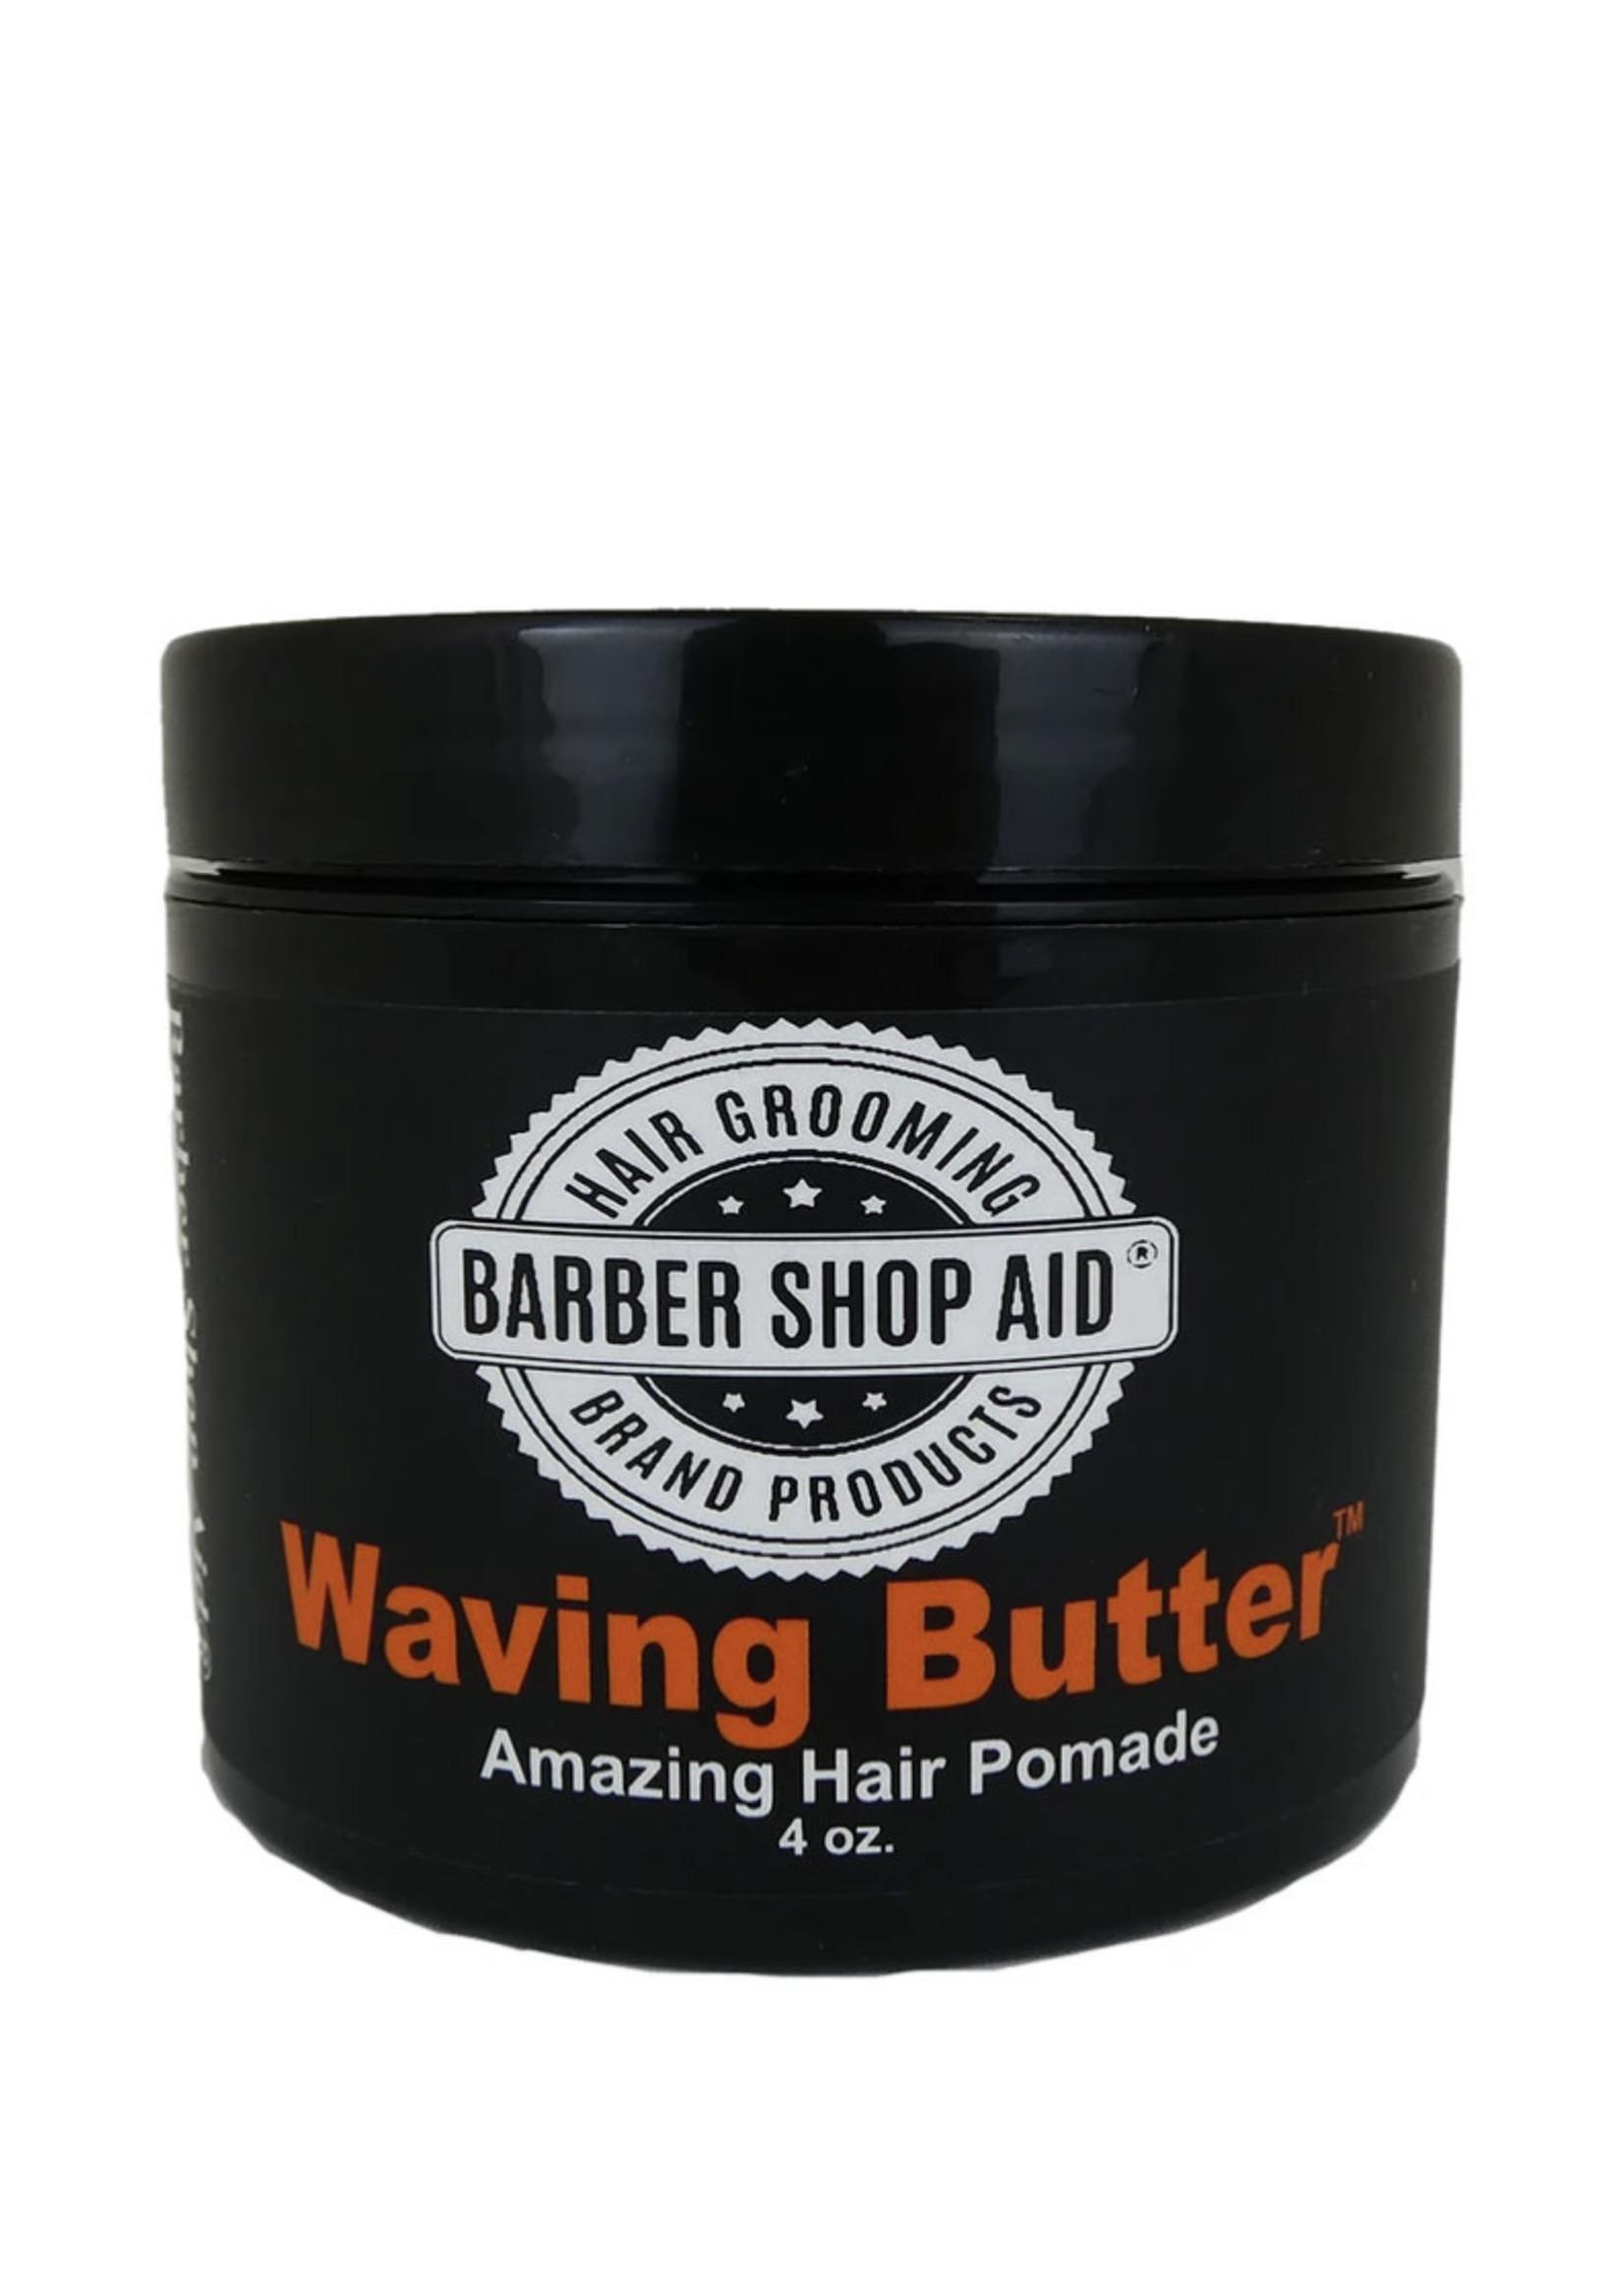 Barbershop Aid- Waving Butter